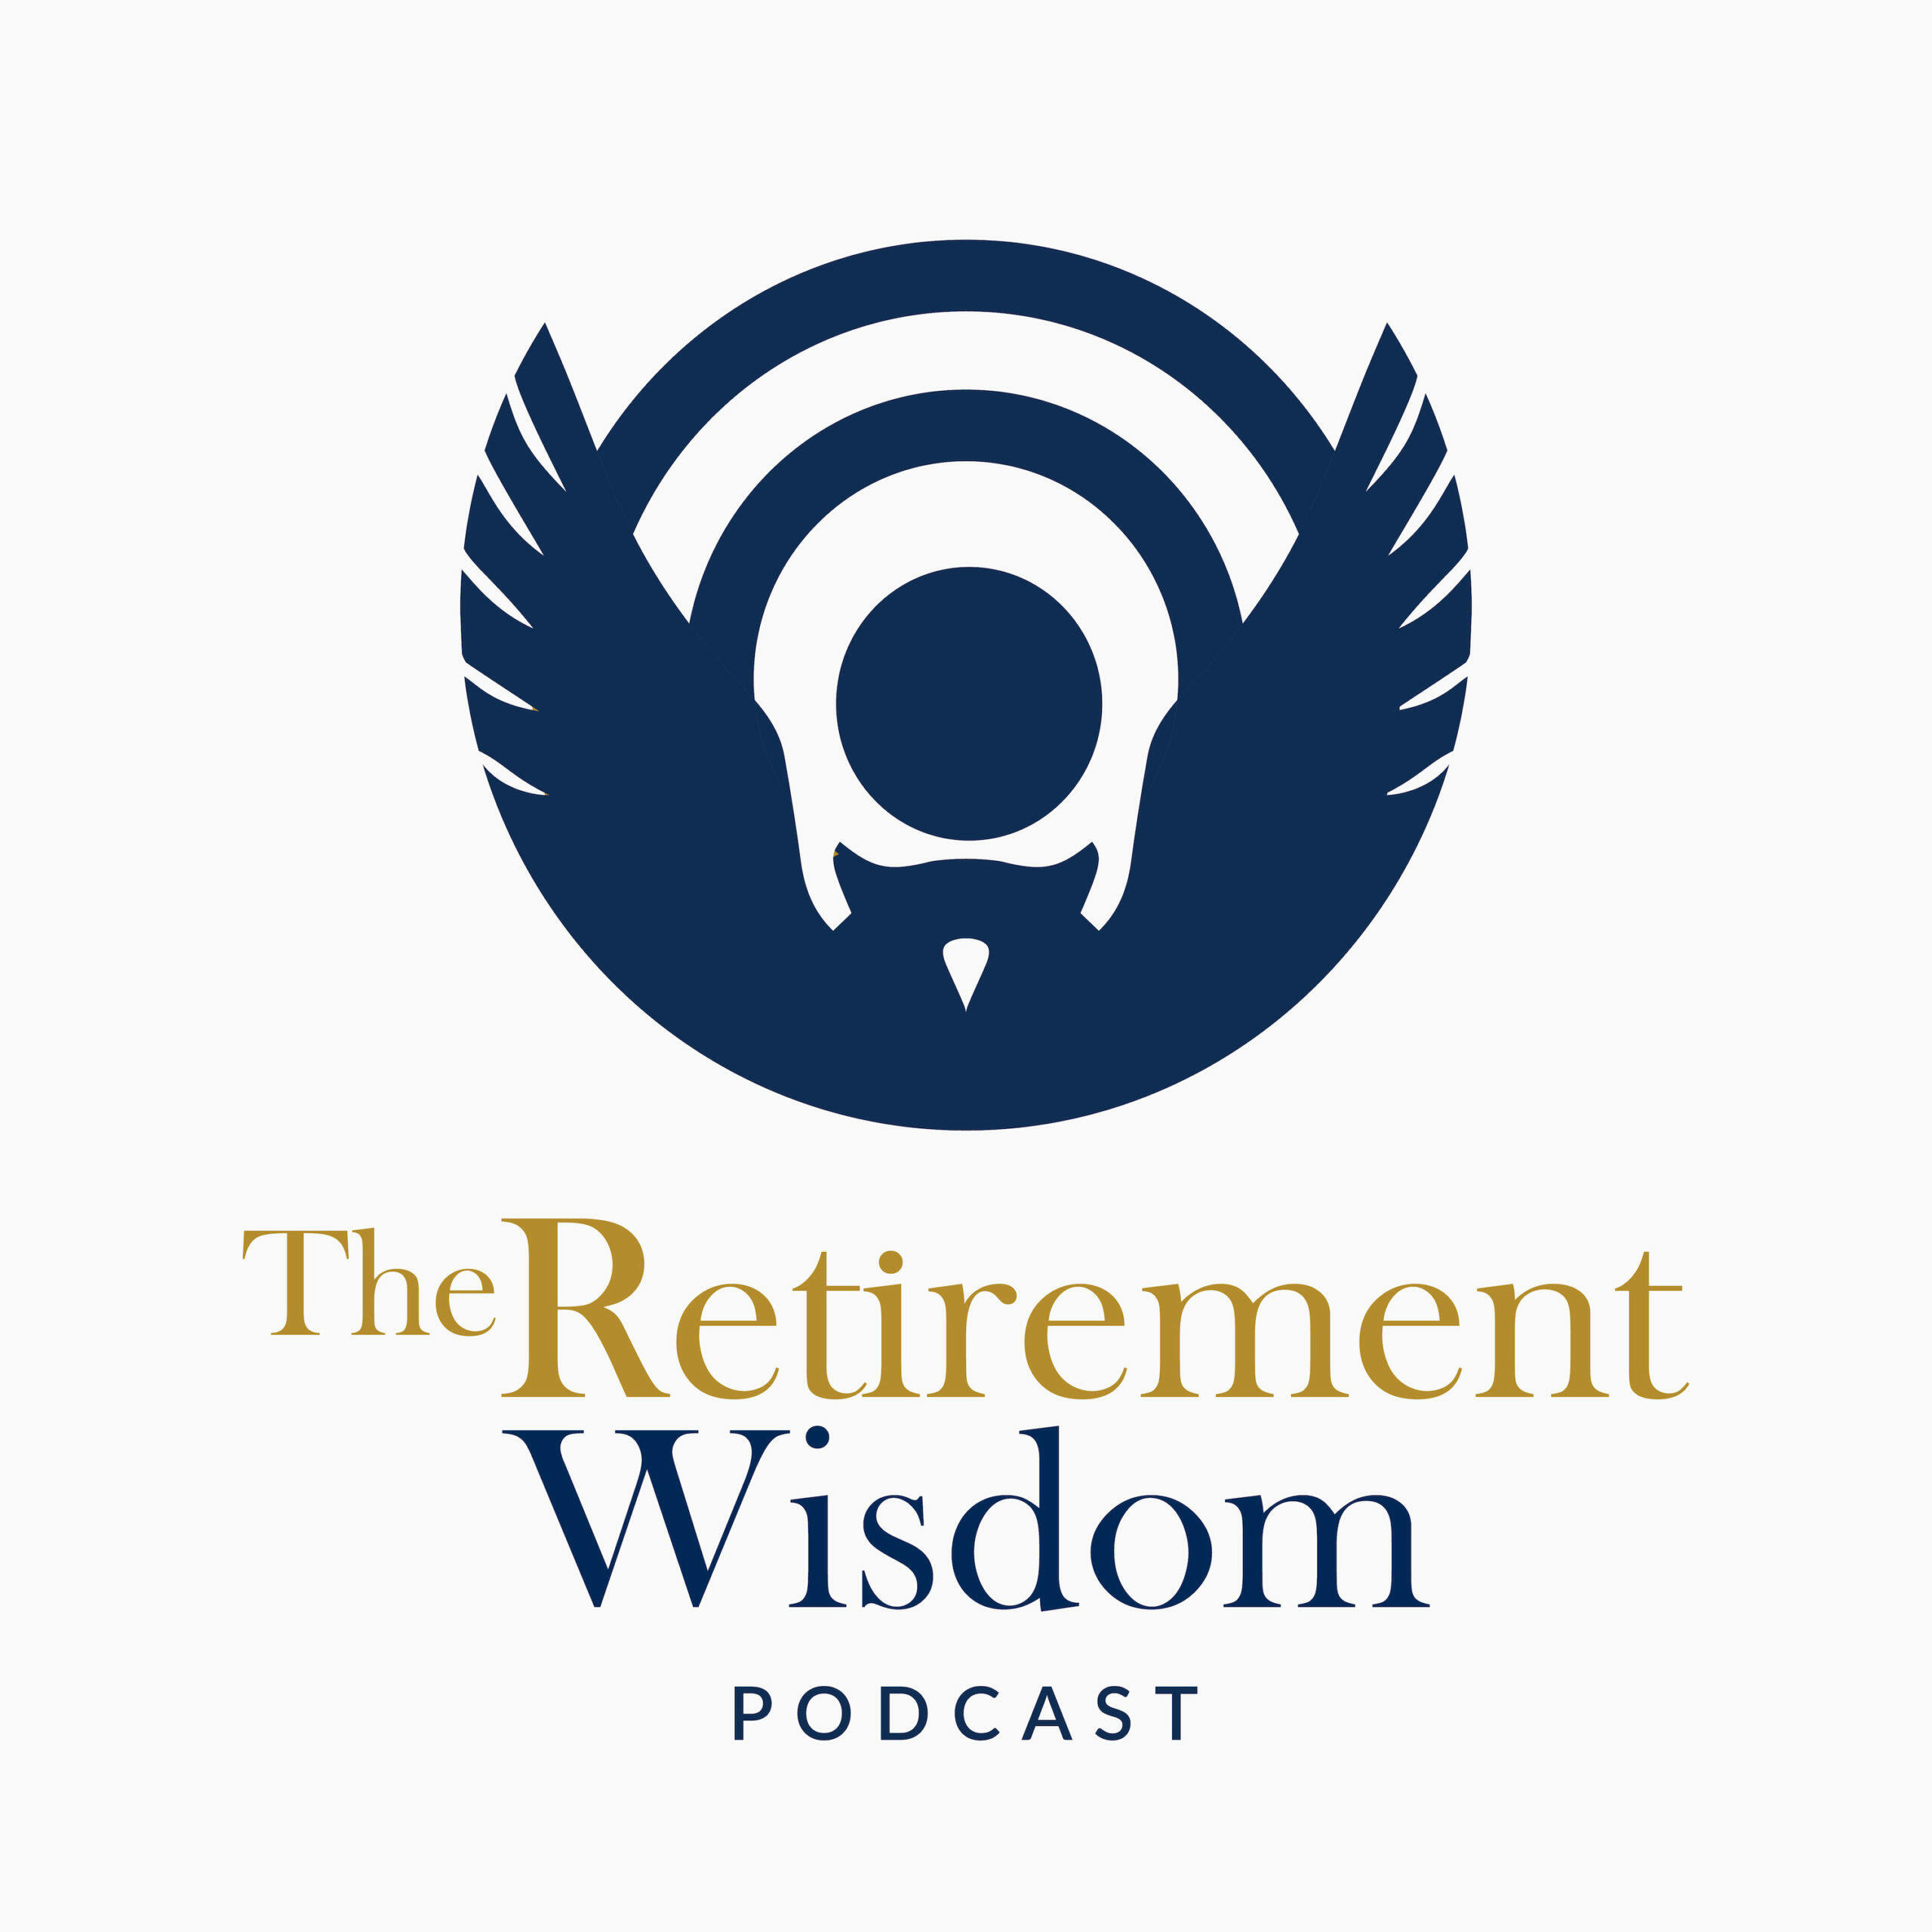 The Retirement Wisdom Podcast